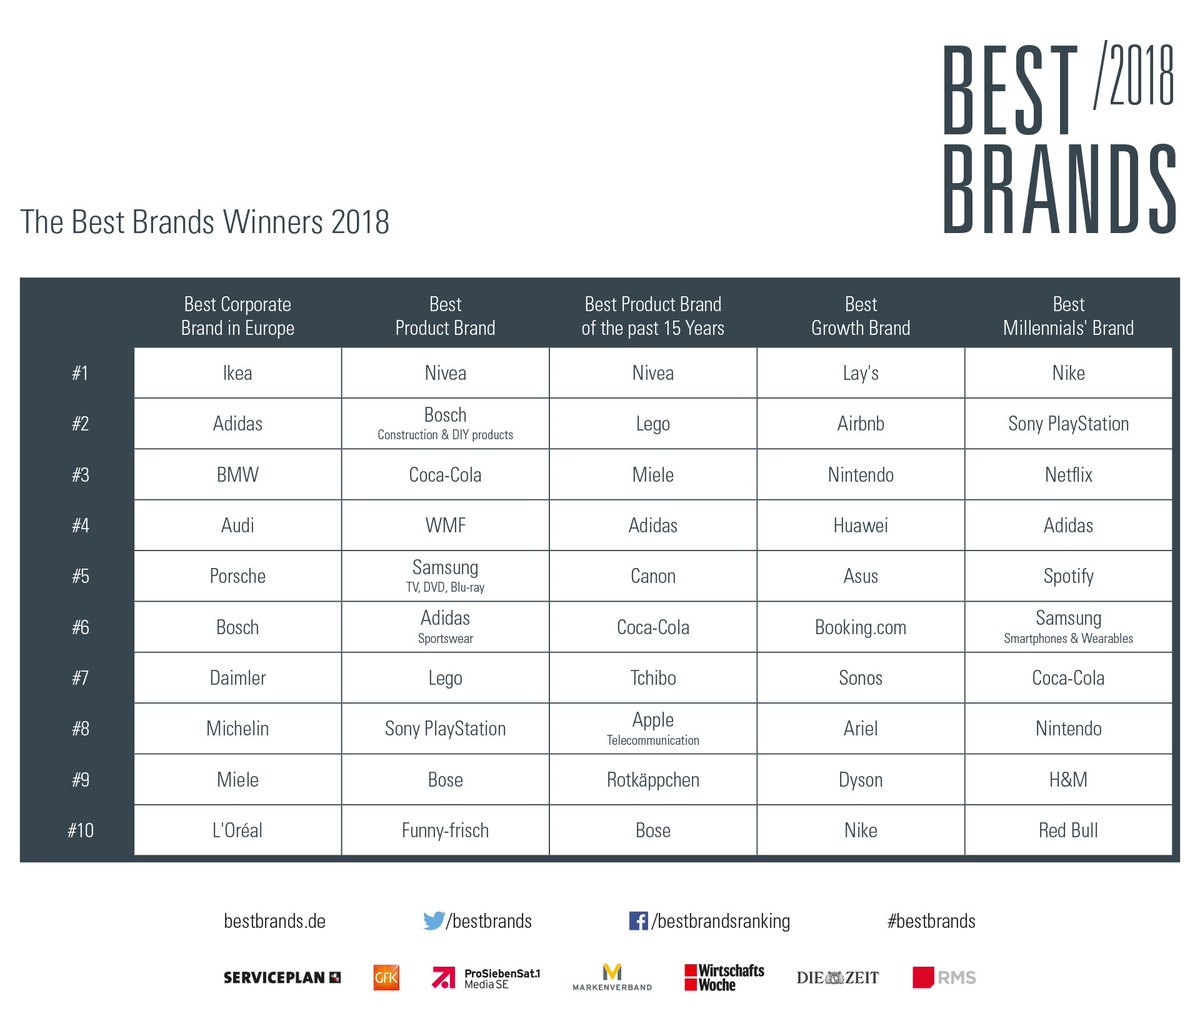 Best Brands on Twitter: